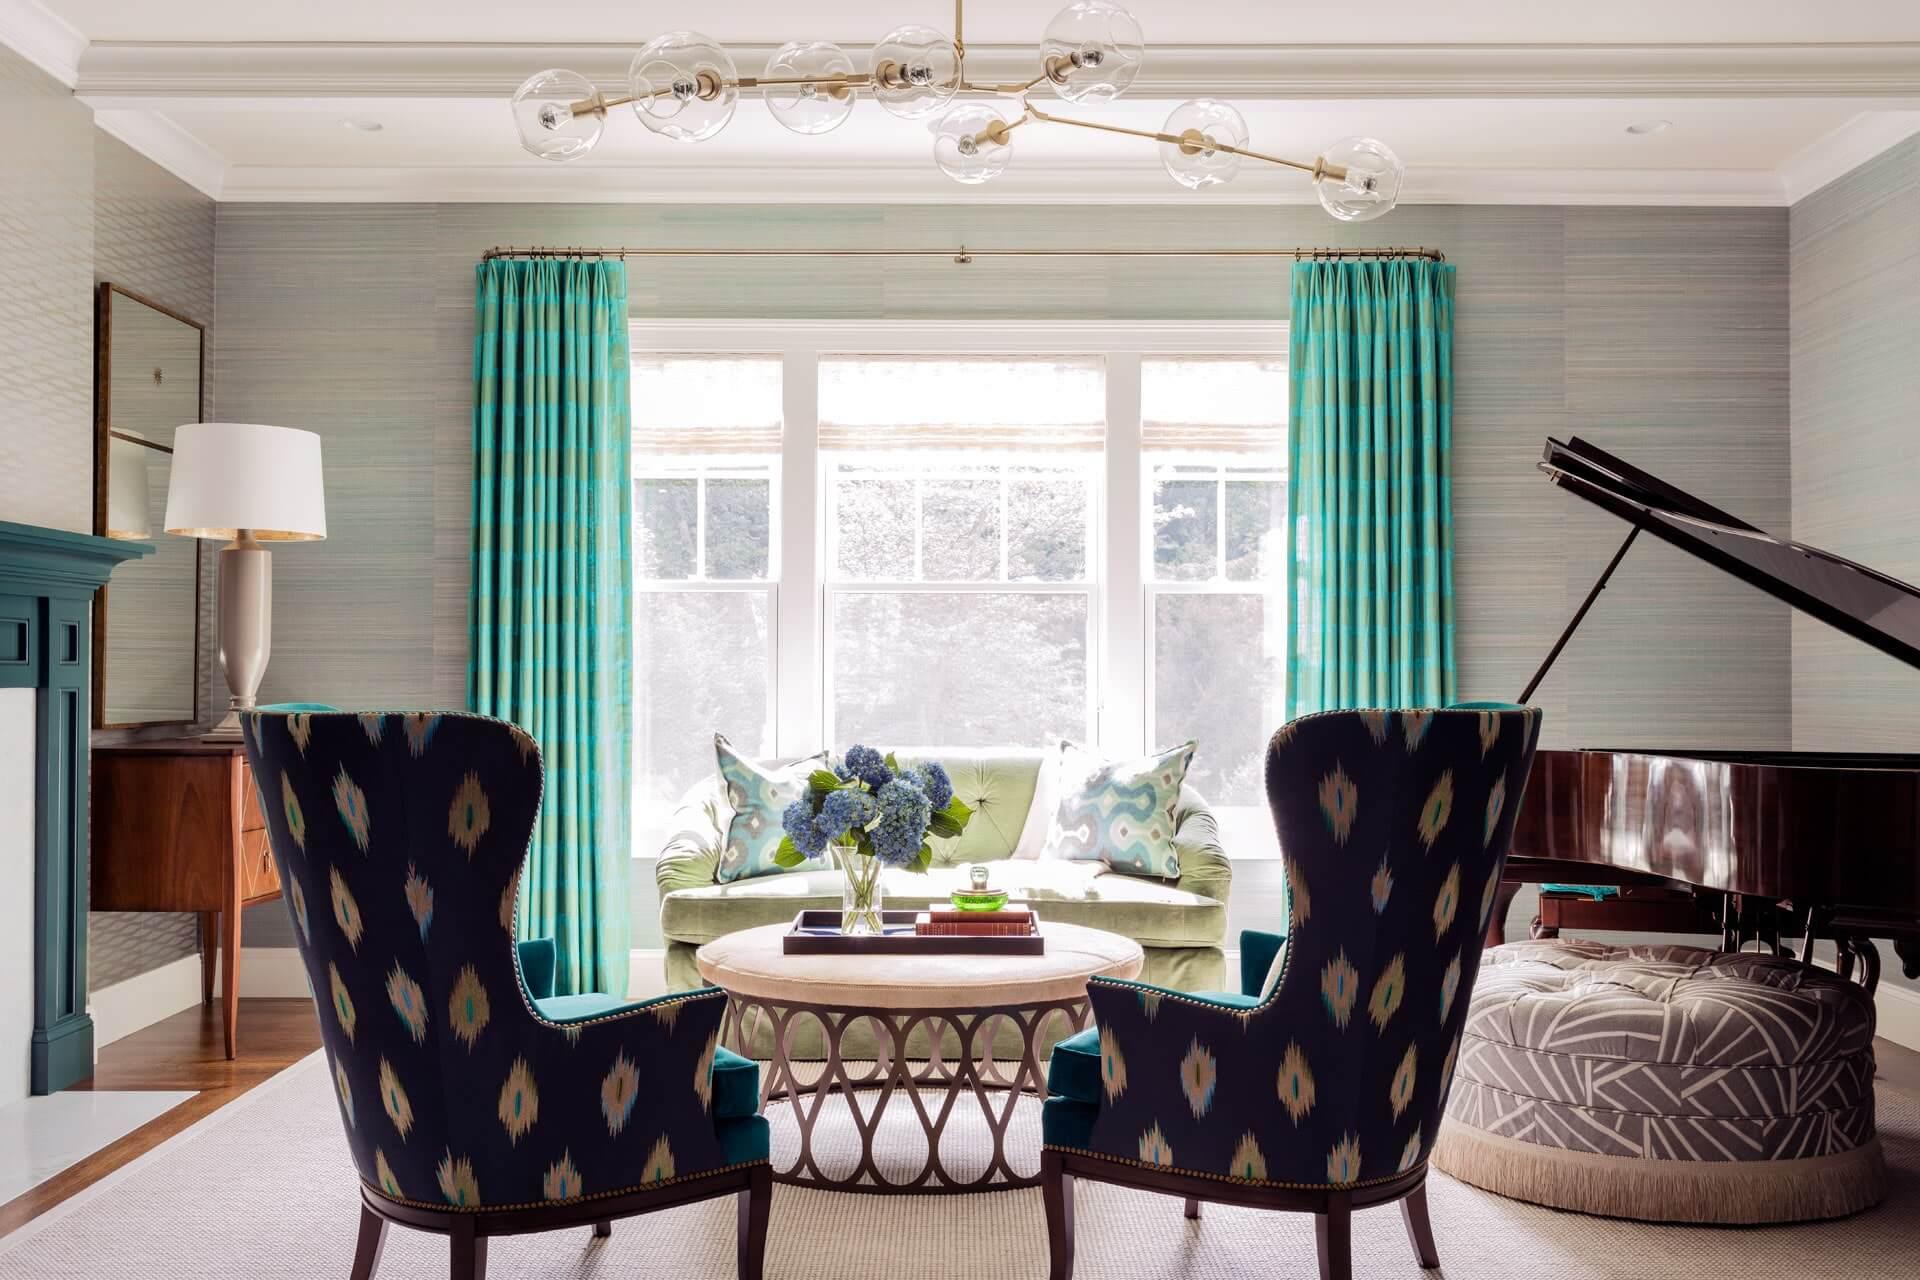 Serene Sanctuary Estate, - Weston, MA - LeBlanc Design Interiors